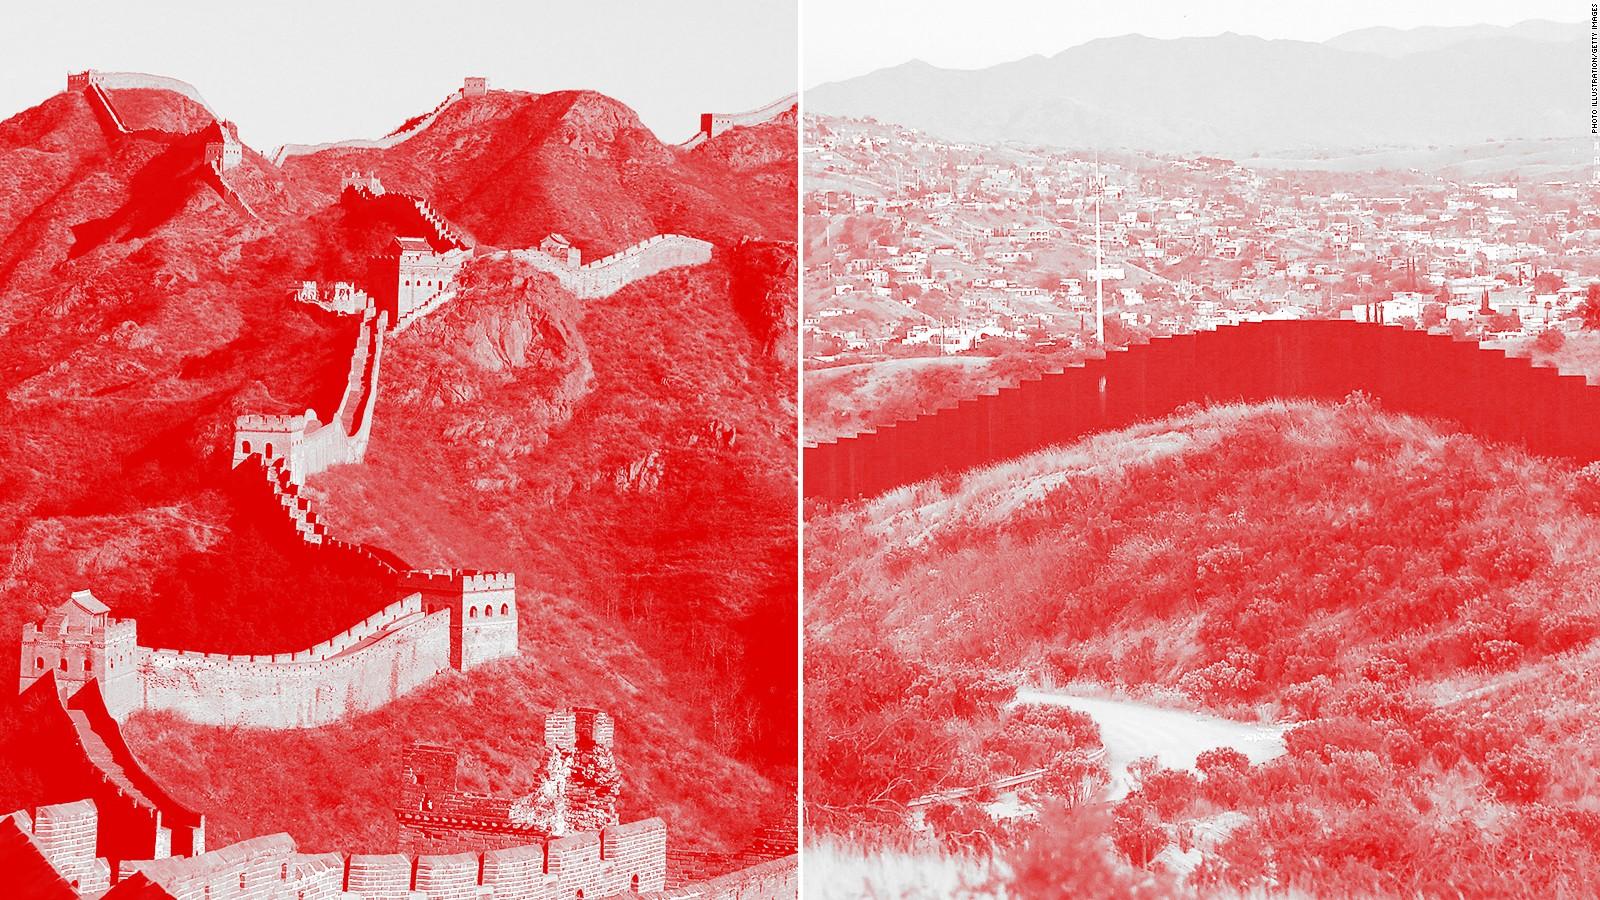 Trumps wall vs the Great Wall of China   CNNPolitics 1600x900